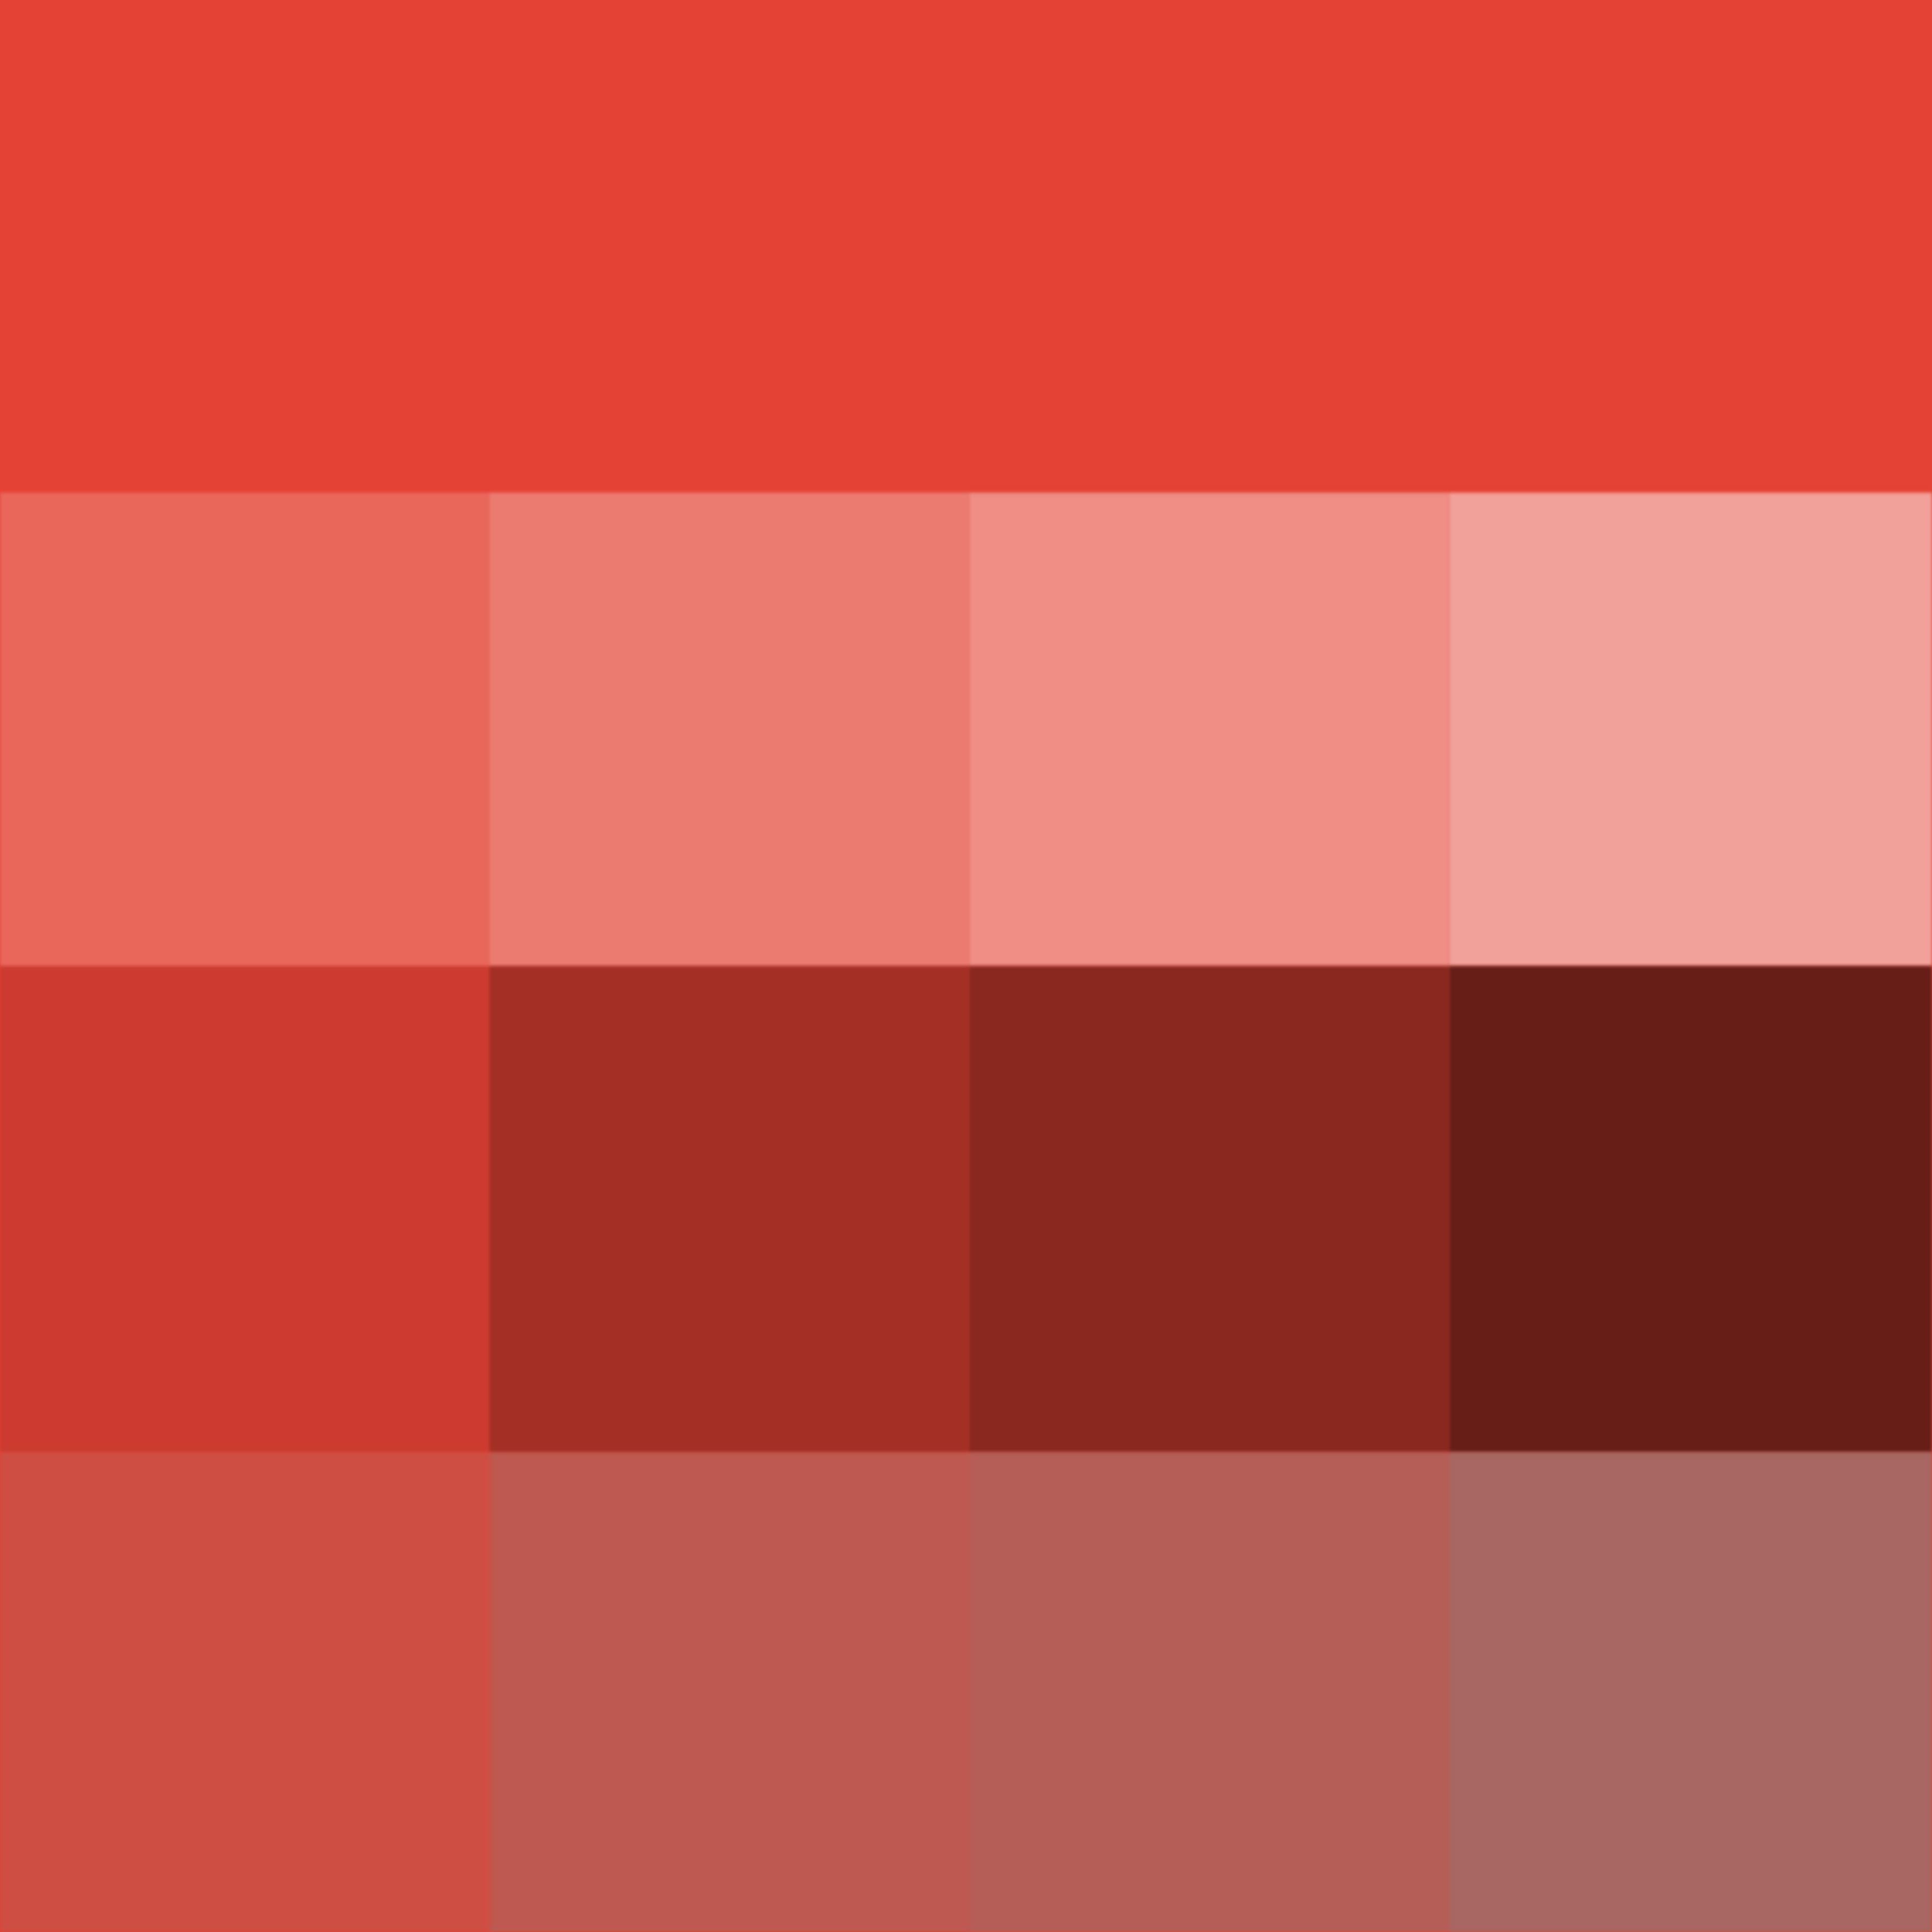 #Vermillion Hue, Tints, Shades & Tones (Hue) ( Pure Color